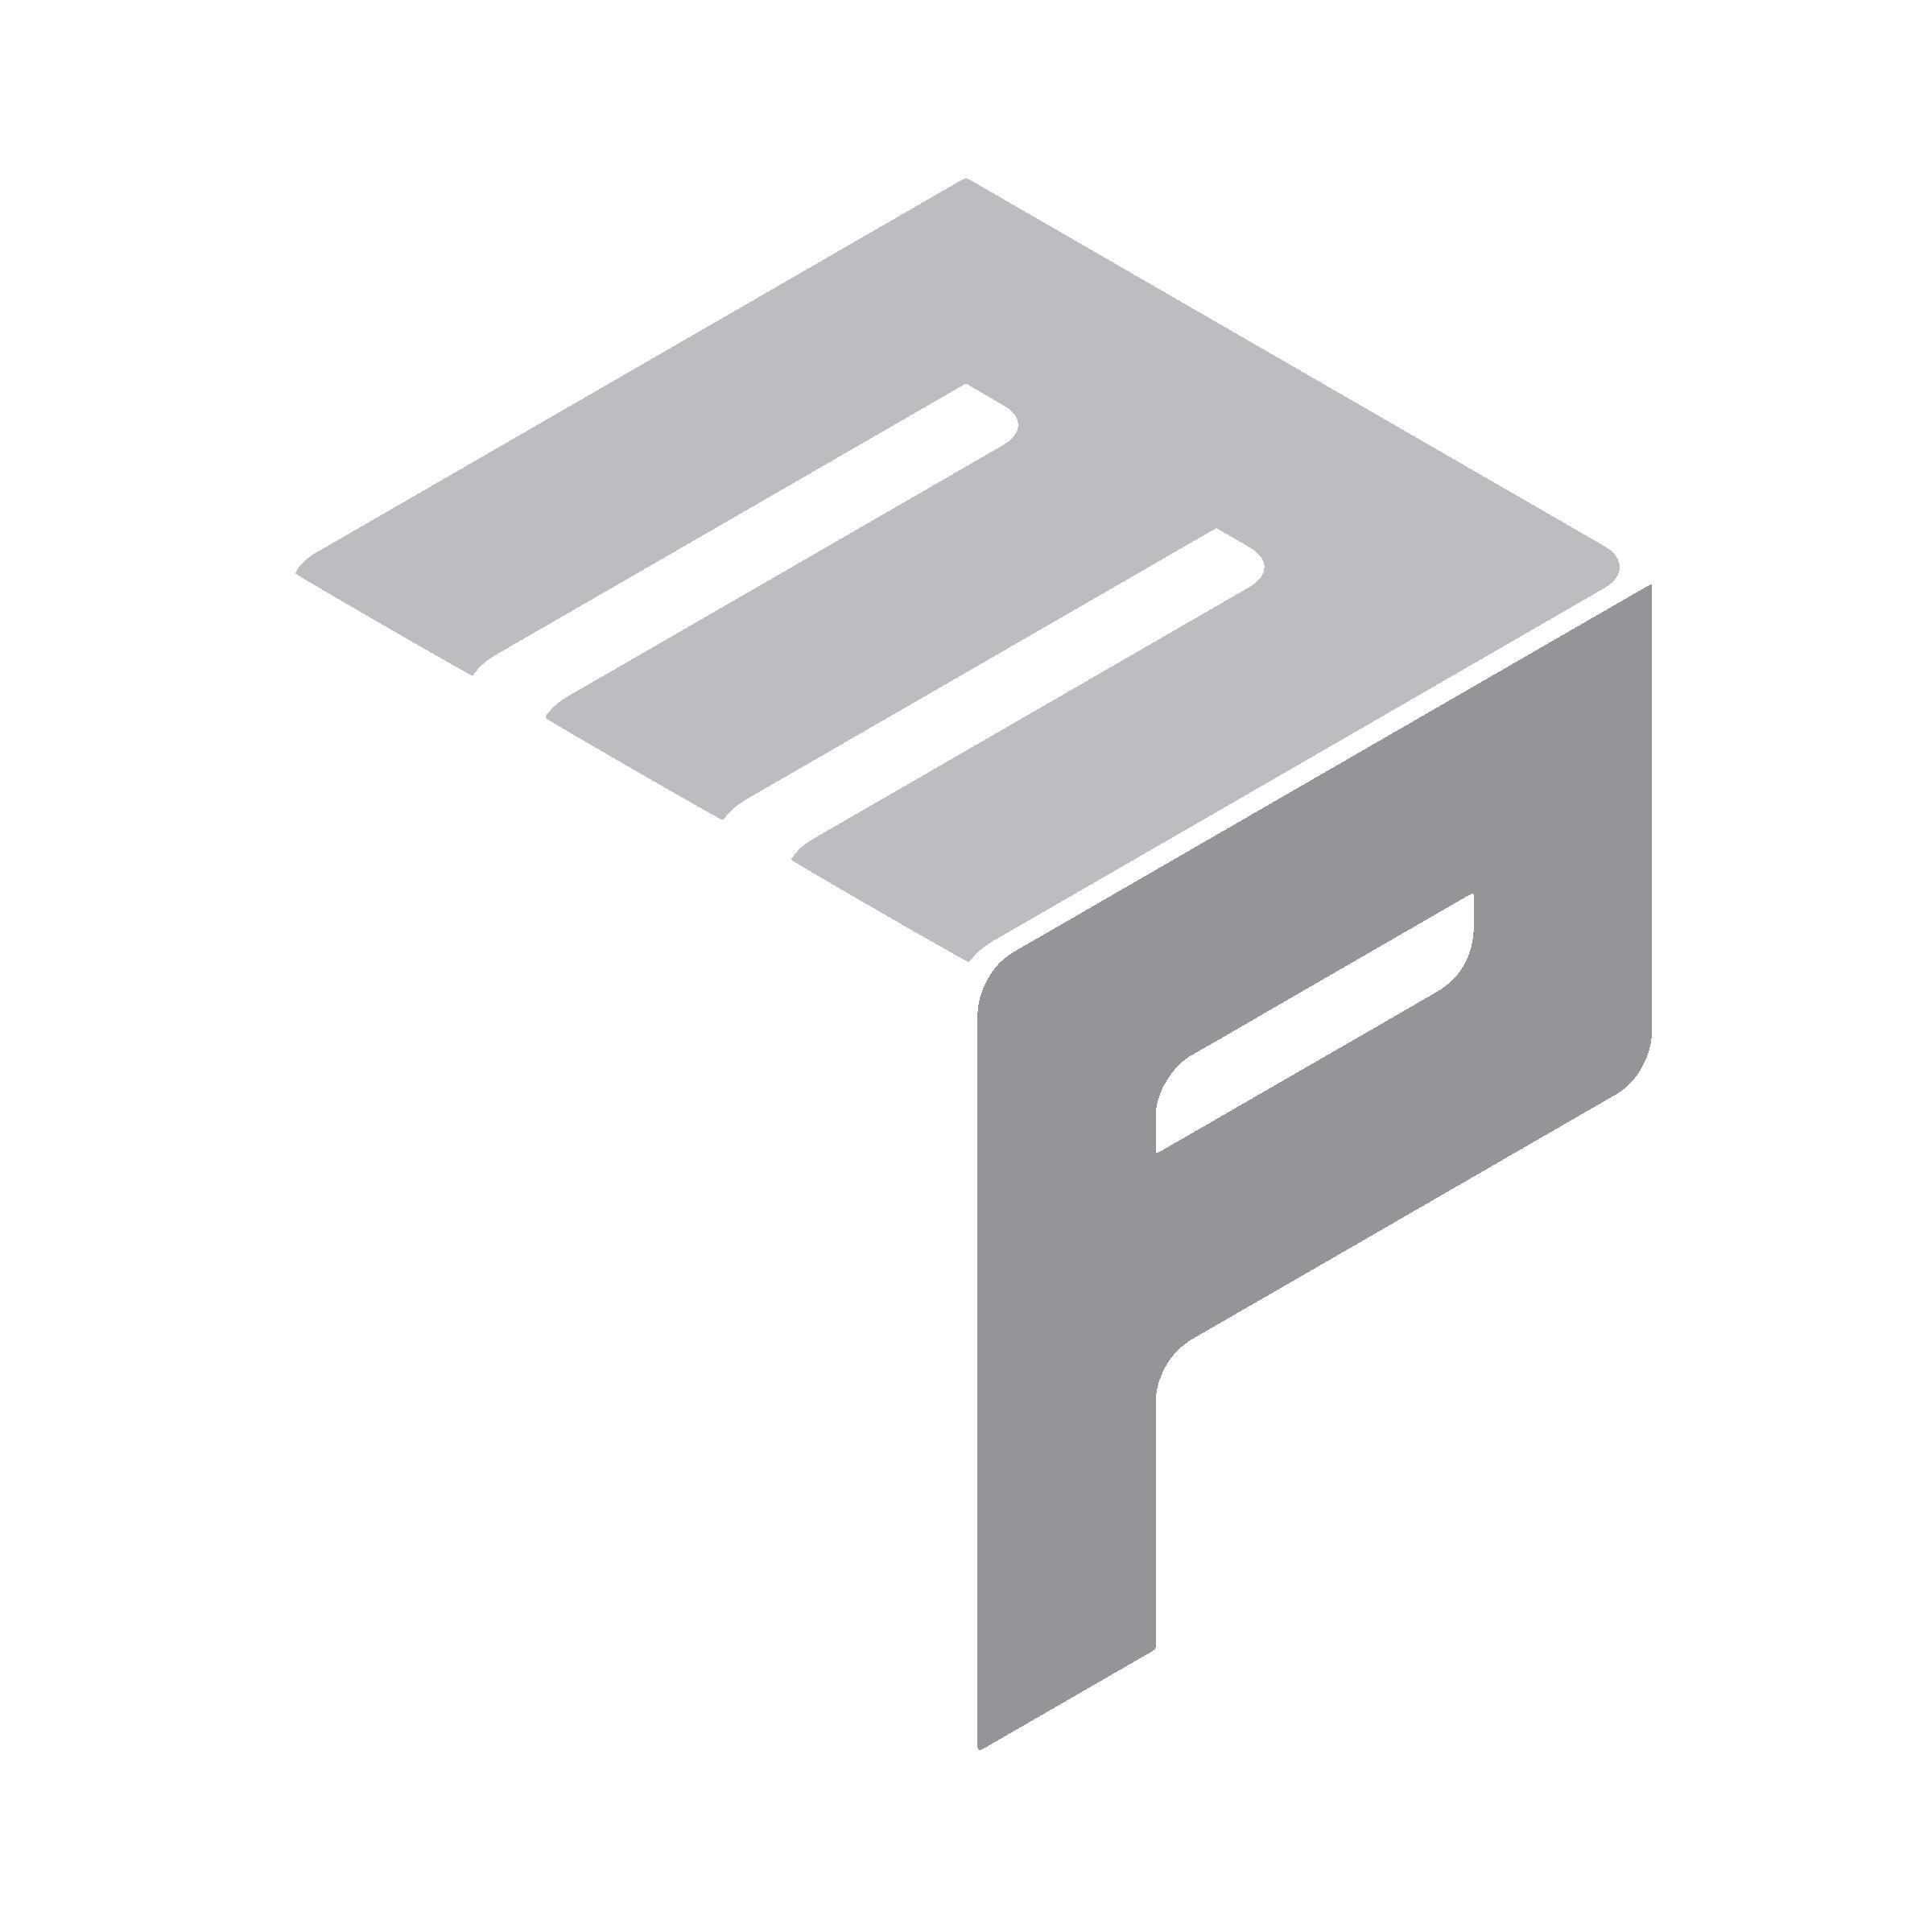 62_EMP Logo 3 Reverse FINAL-01.png